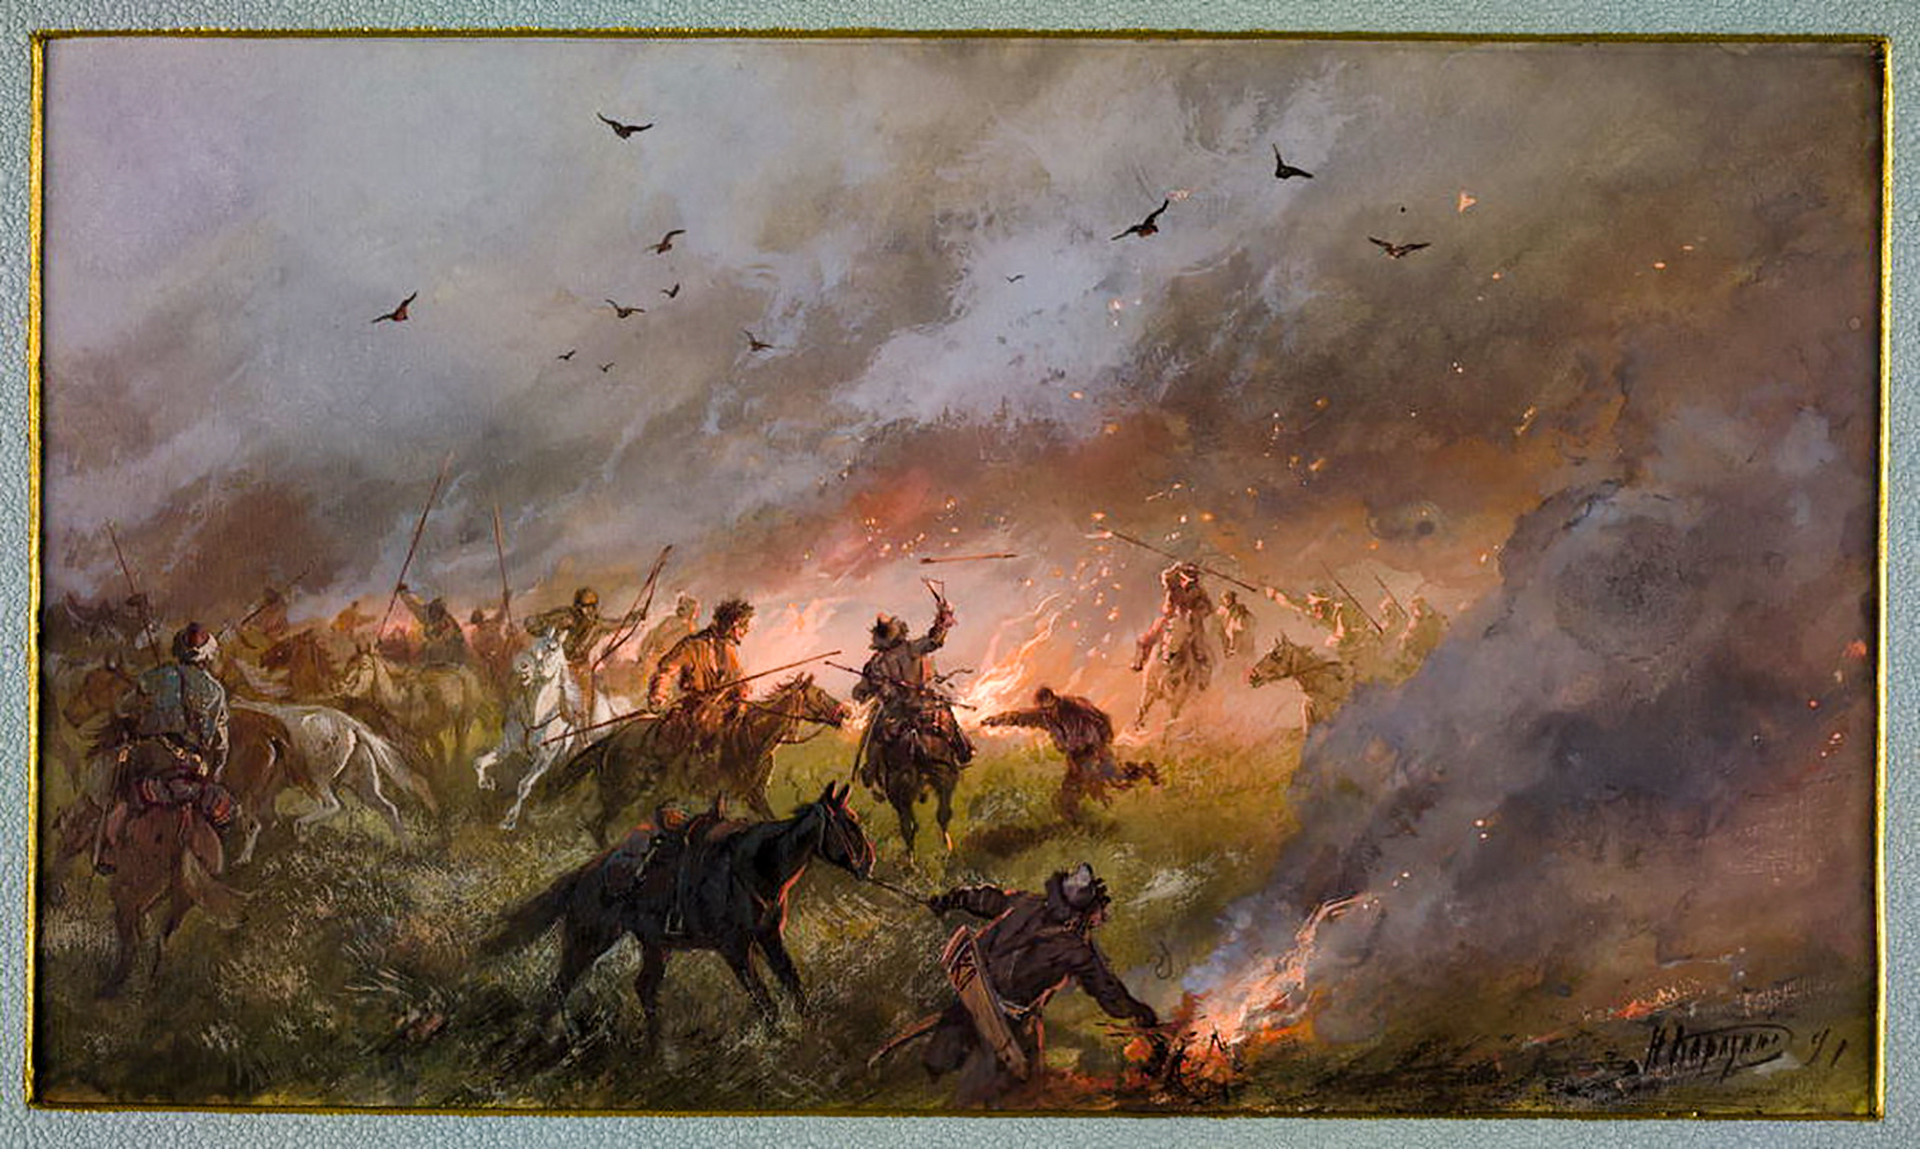 Pugatschow-Aufstand in Sibirien von Nikolai Karasin